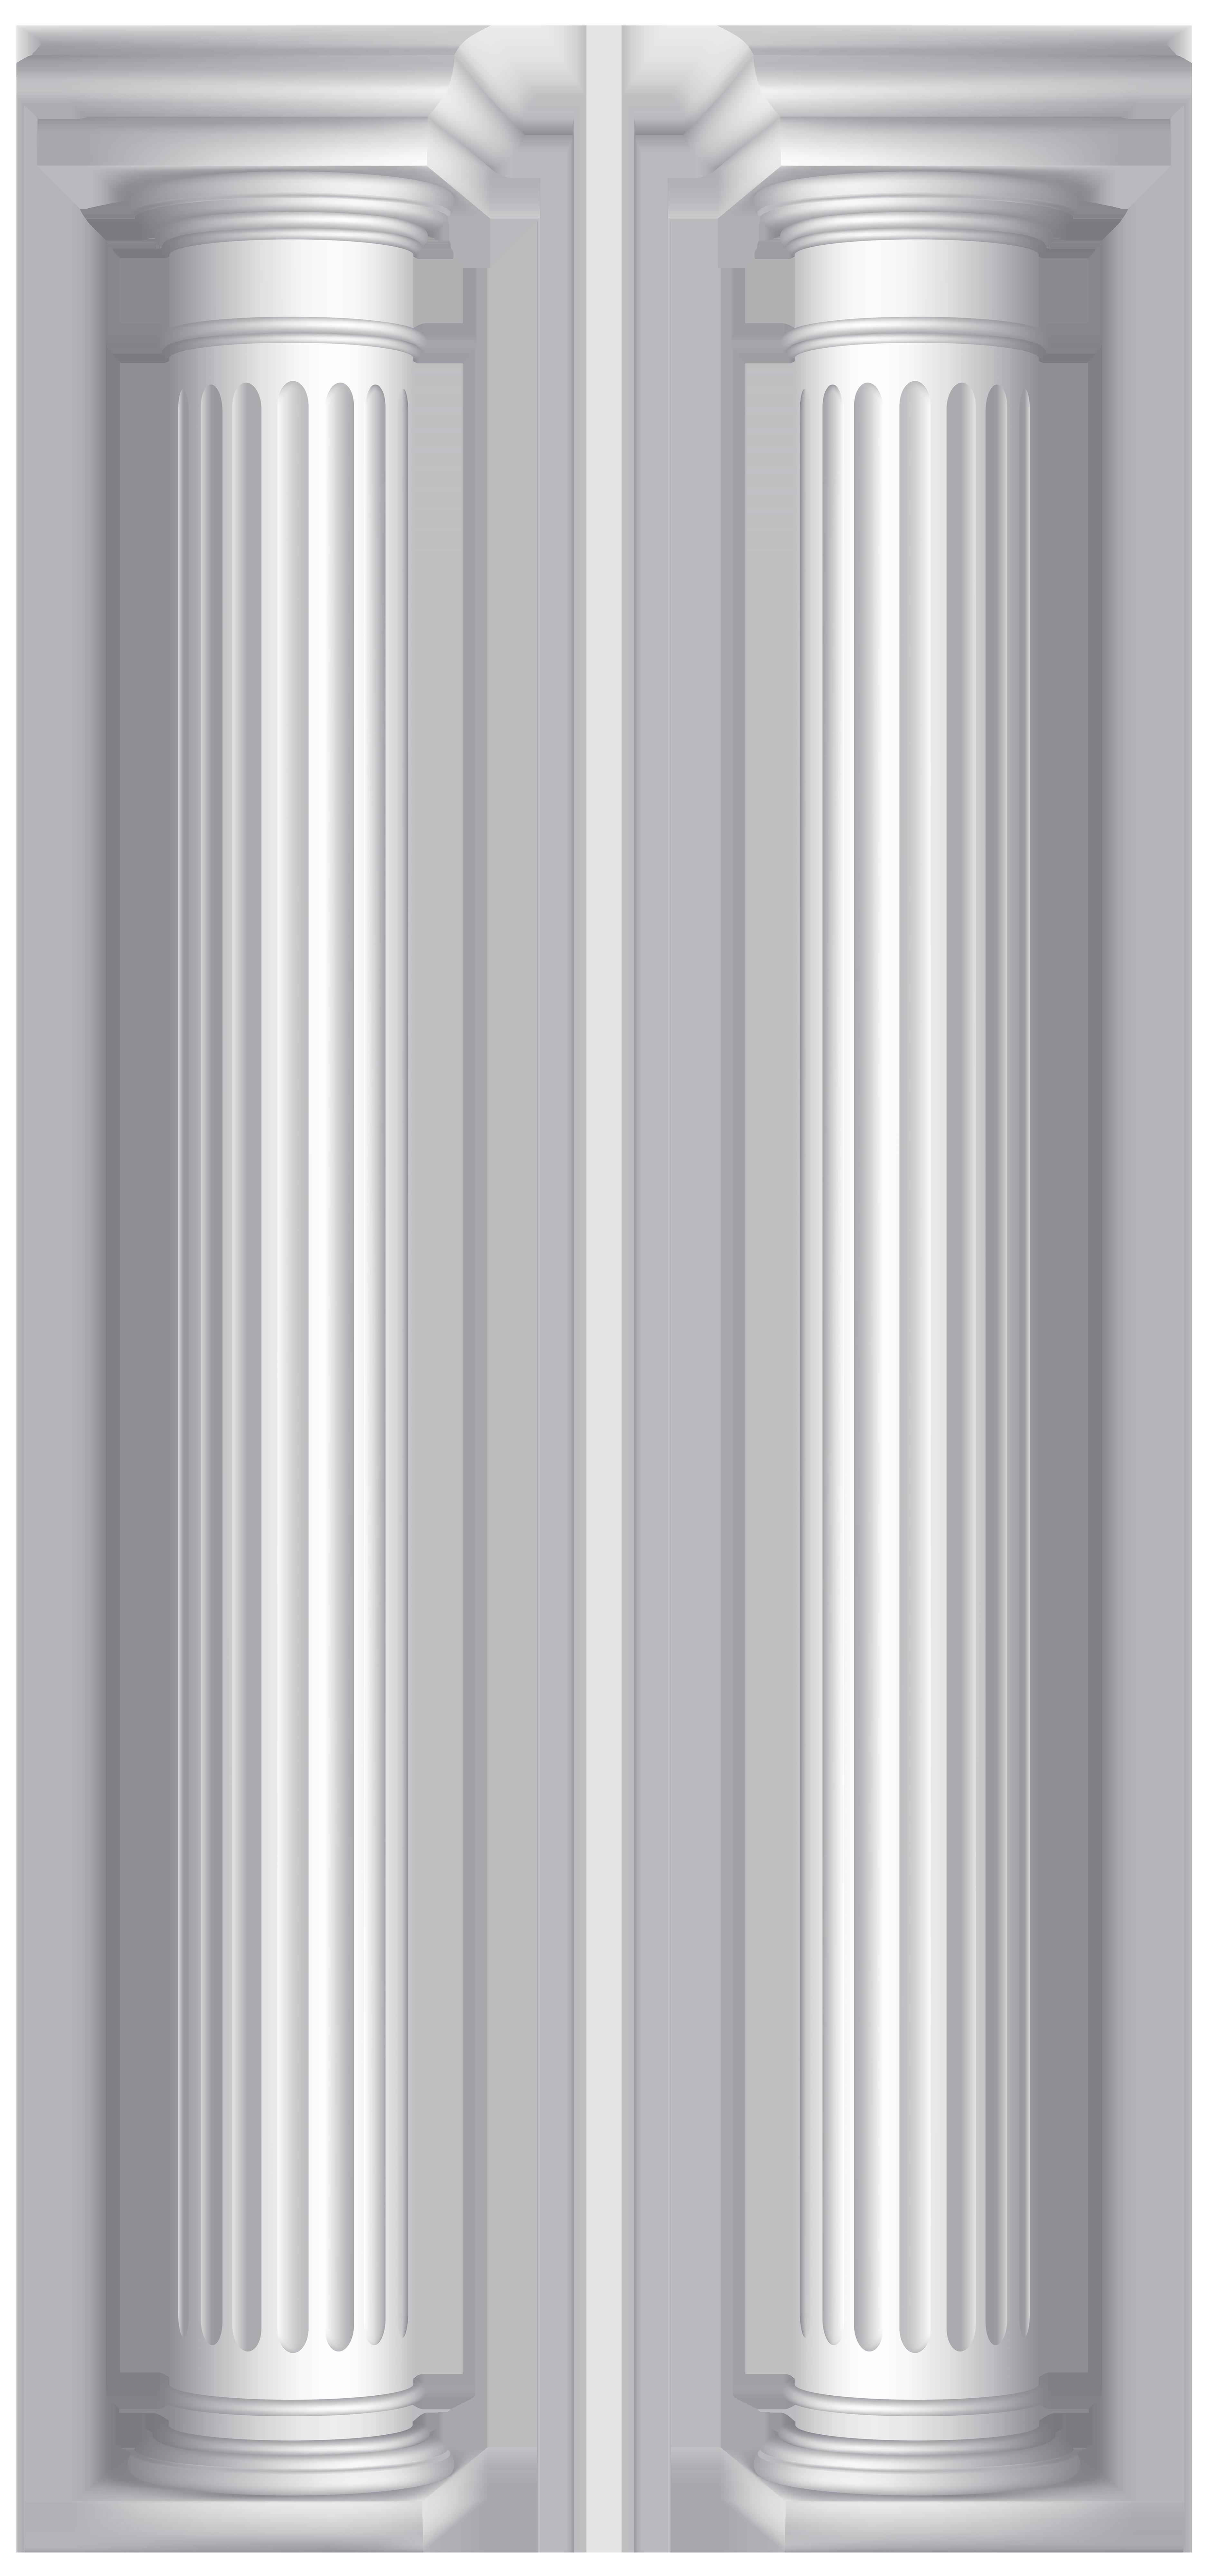 clip freeuse download Column clipart marble column. Columns png clip art